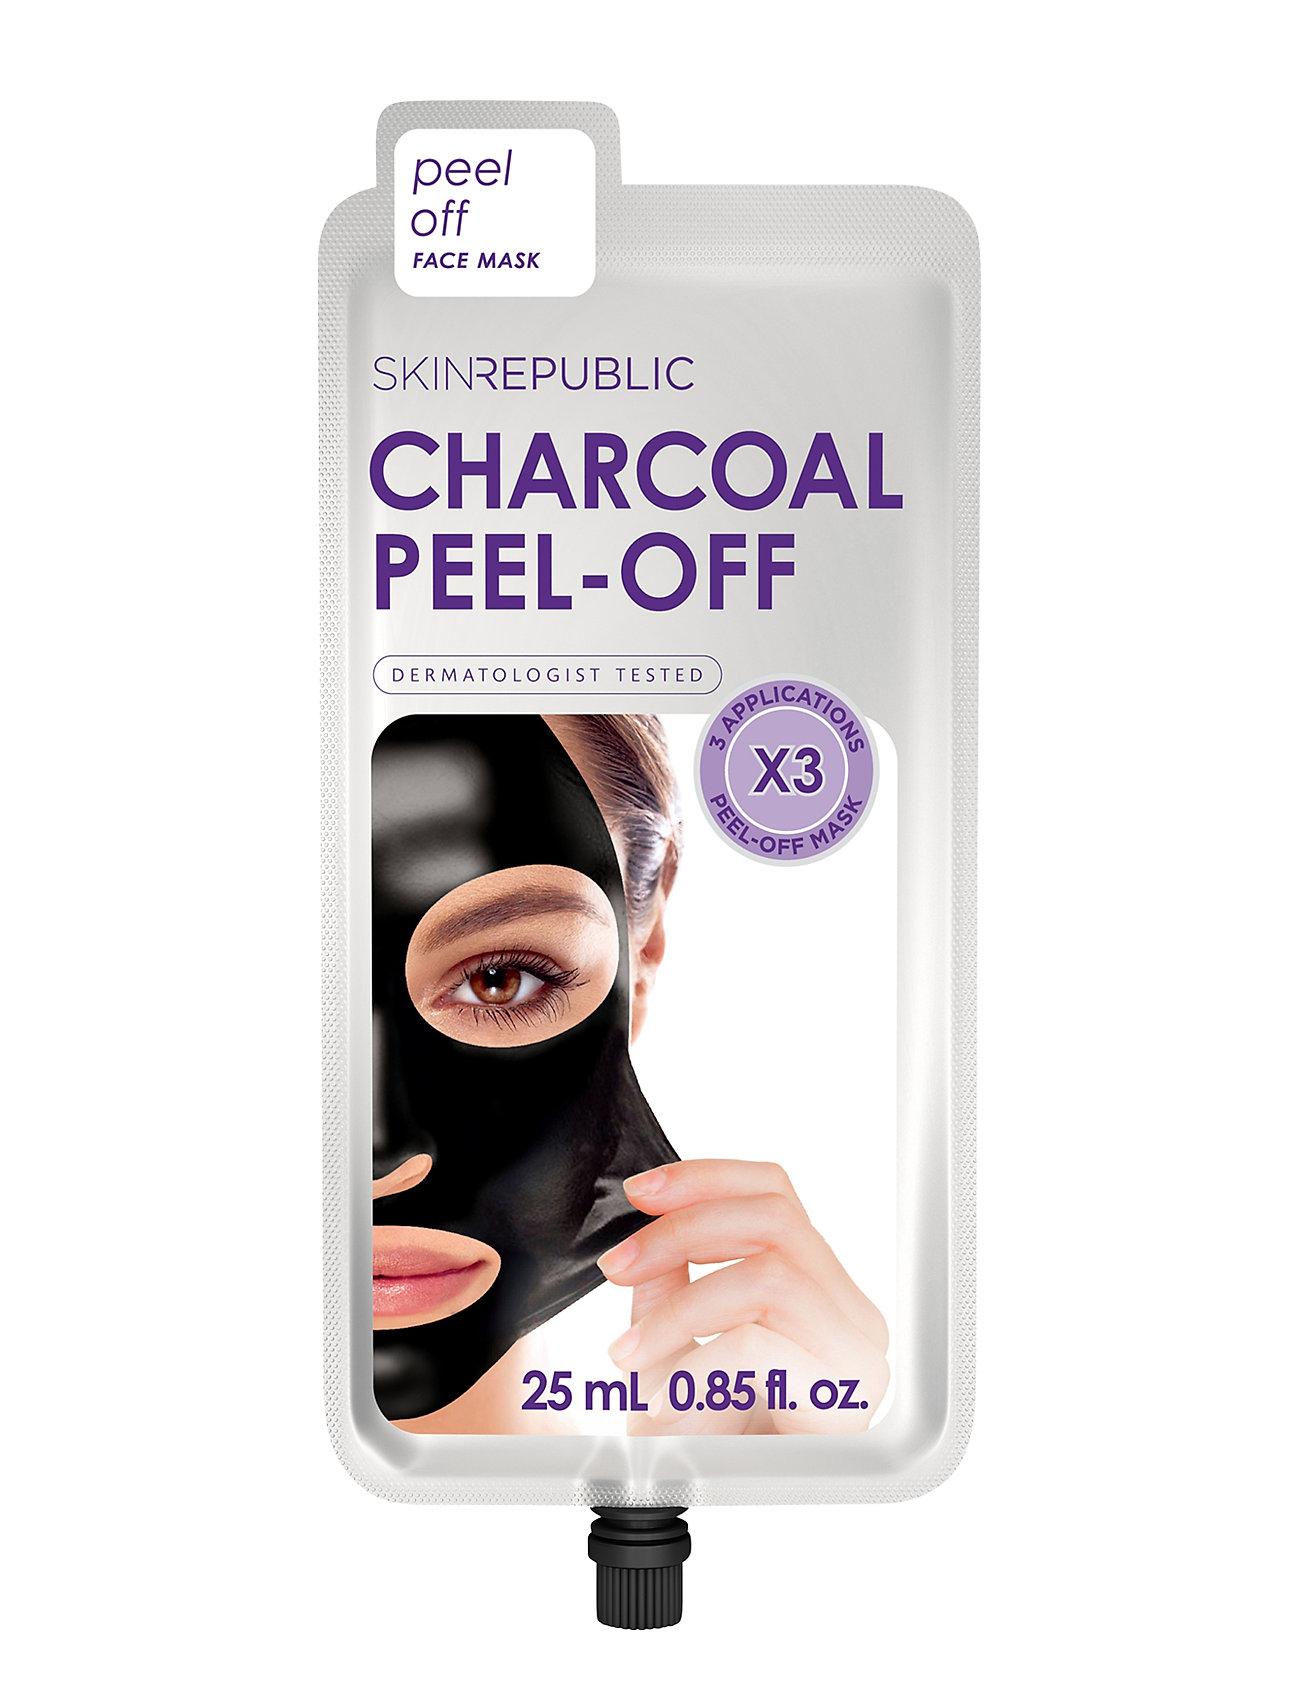 Skin Republic Charcoal Peel-off Face Mask (3masks) - BLACK